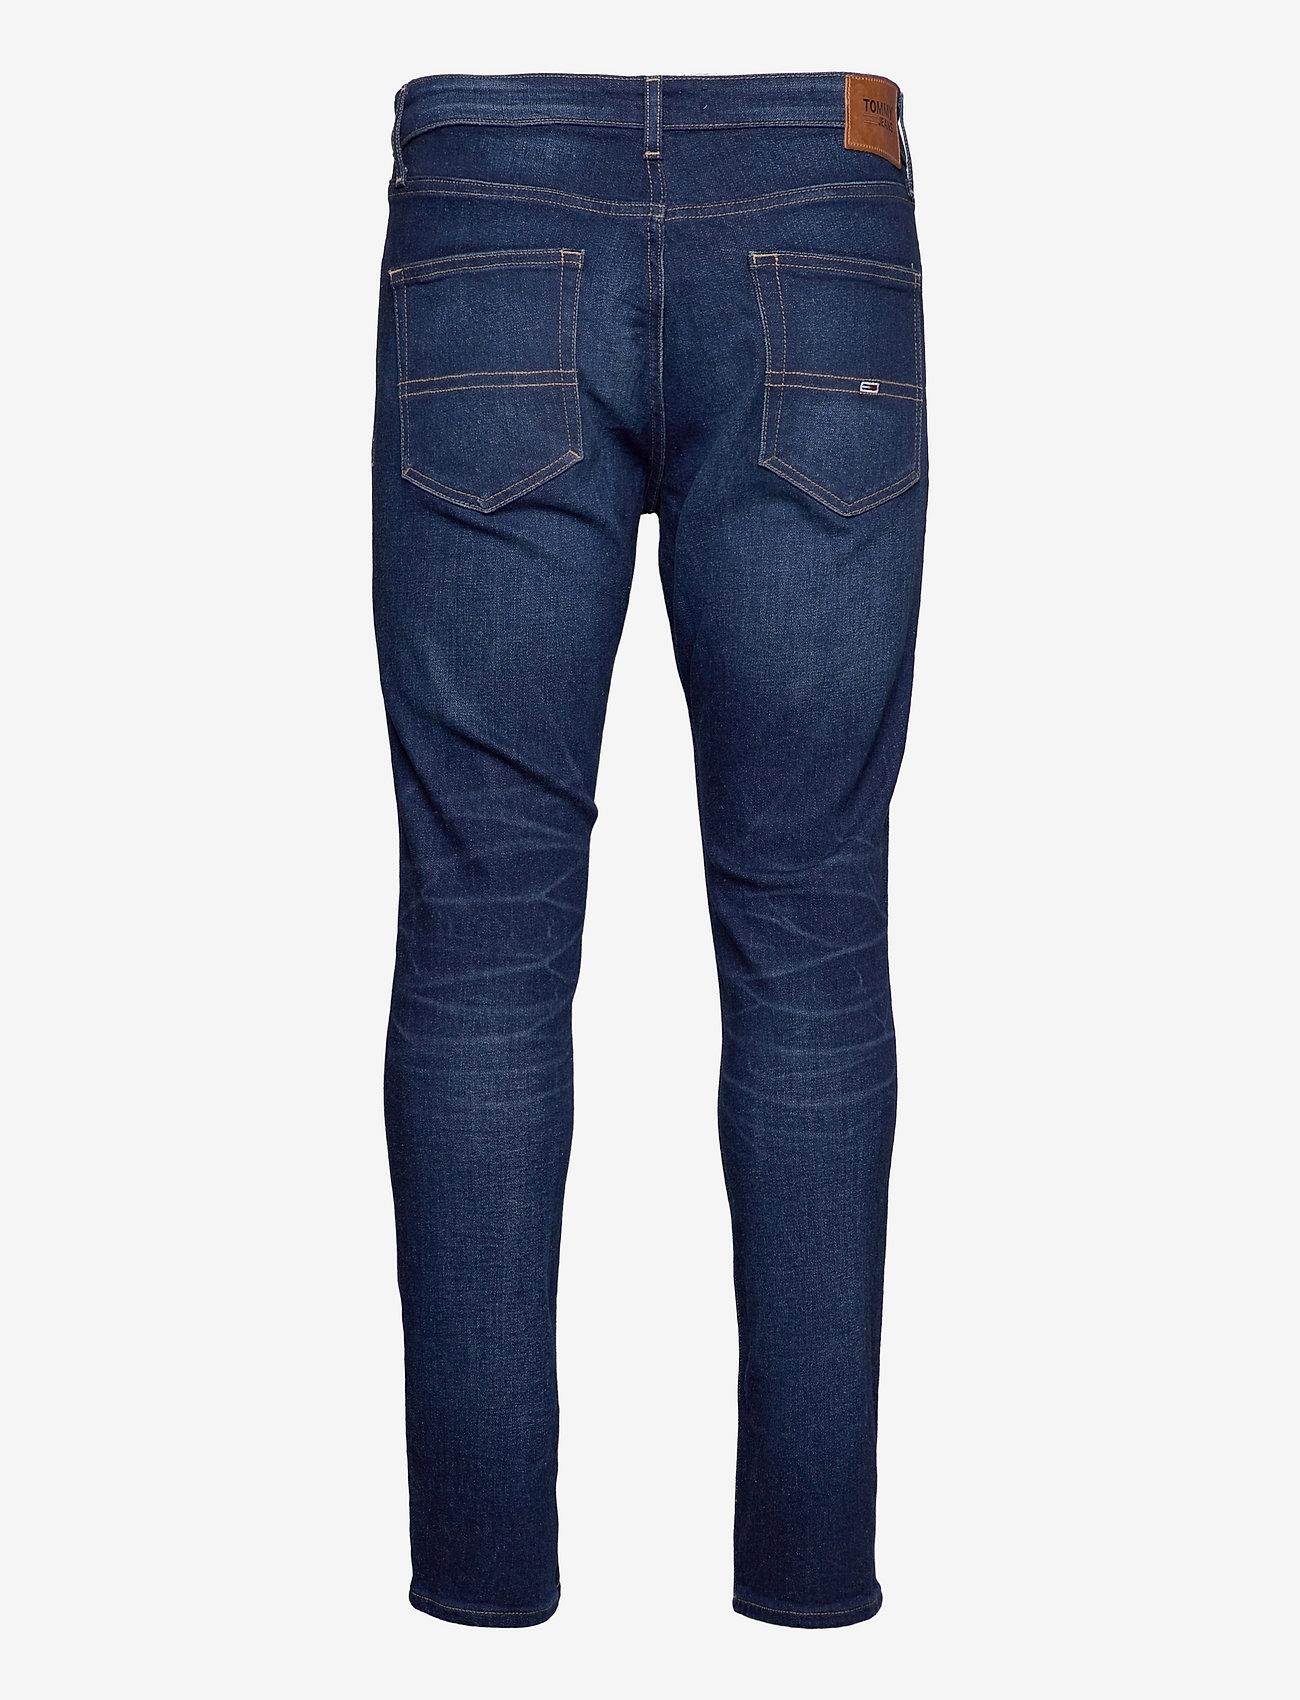 Tommy Jeans - AUSTIN SLIM TPRD BE159 DBSTR - slim jeans - denim dark - 1